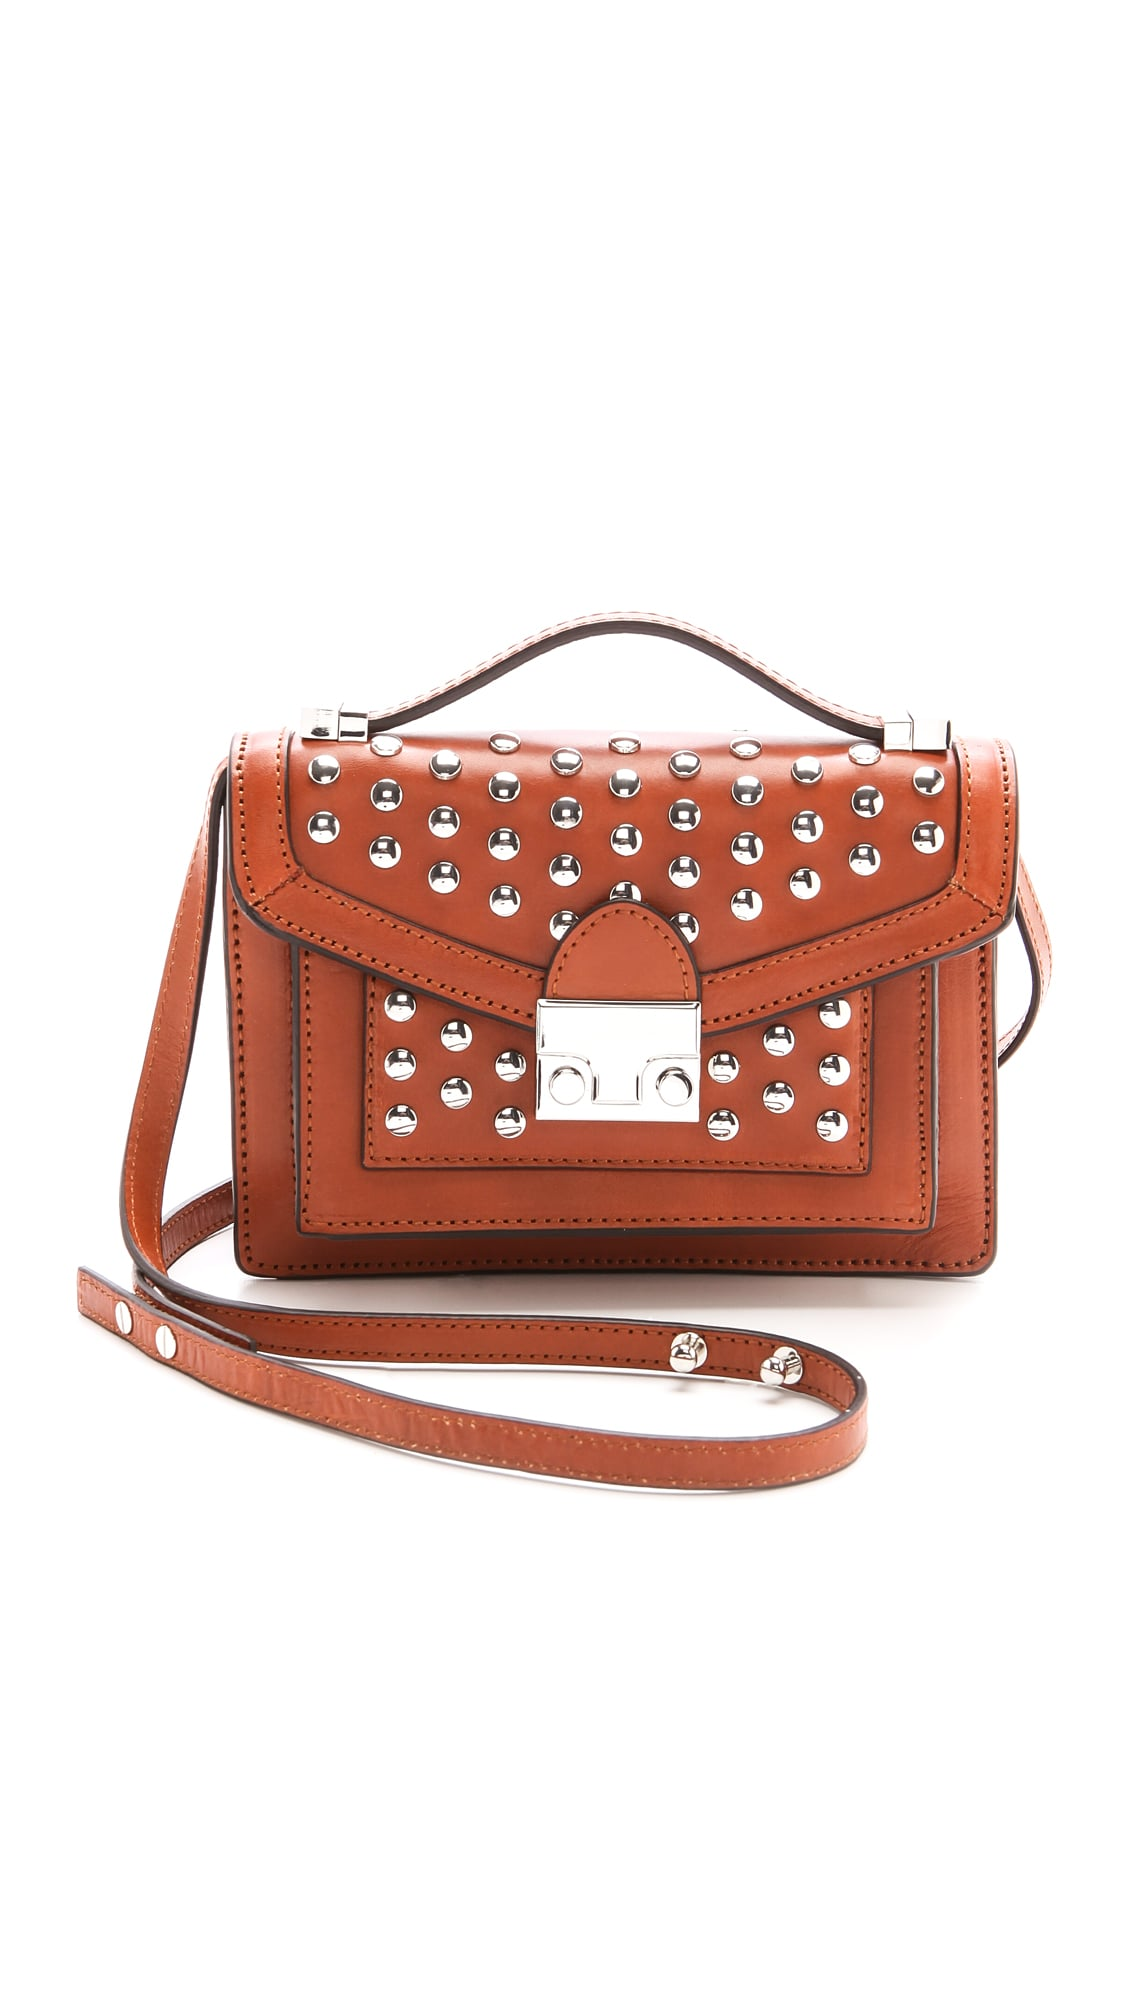 Loeffler Randall Studded Mini Bag